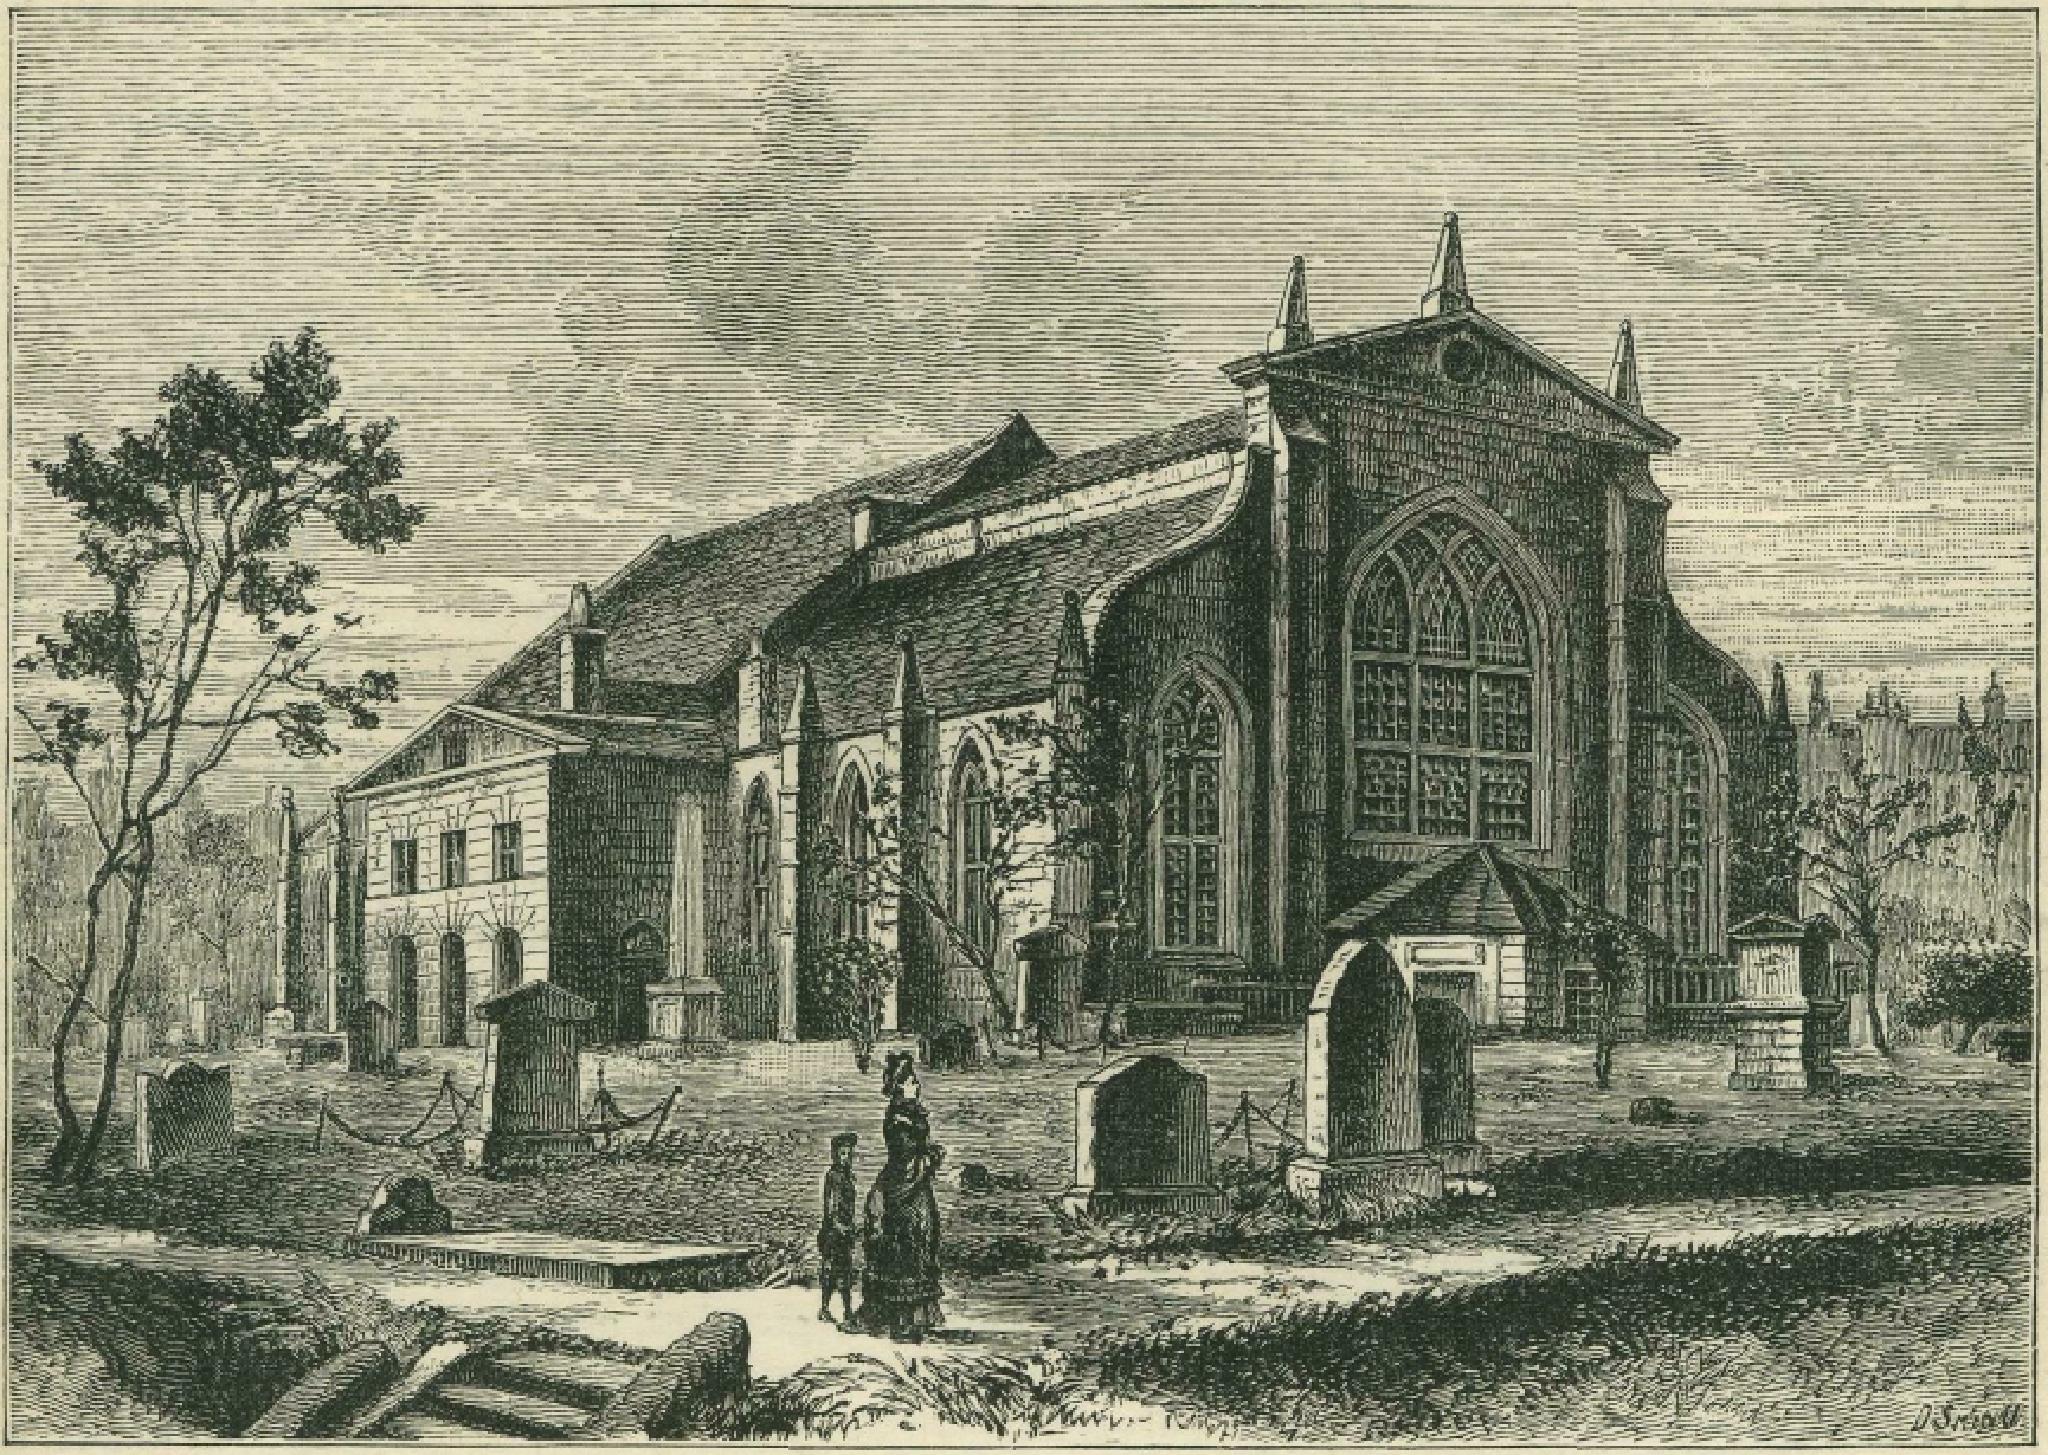 Old Greyfriars Church before Edinburgh built up aound it